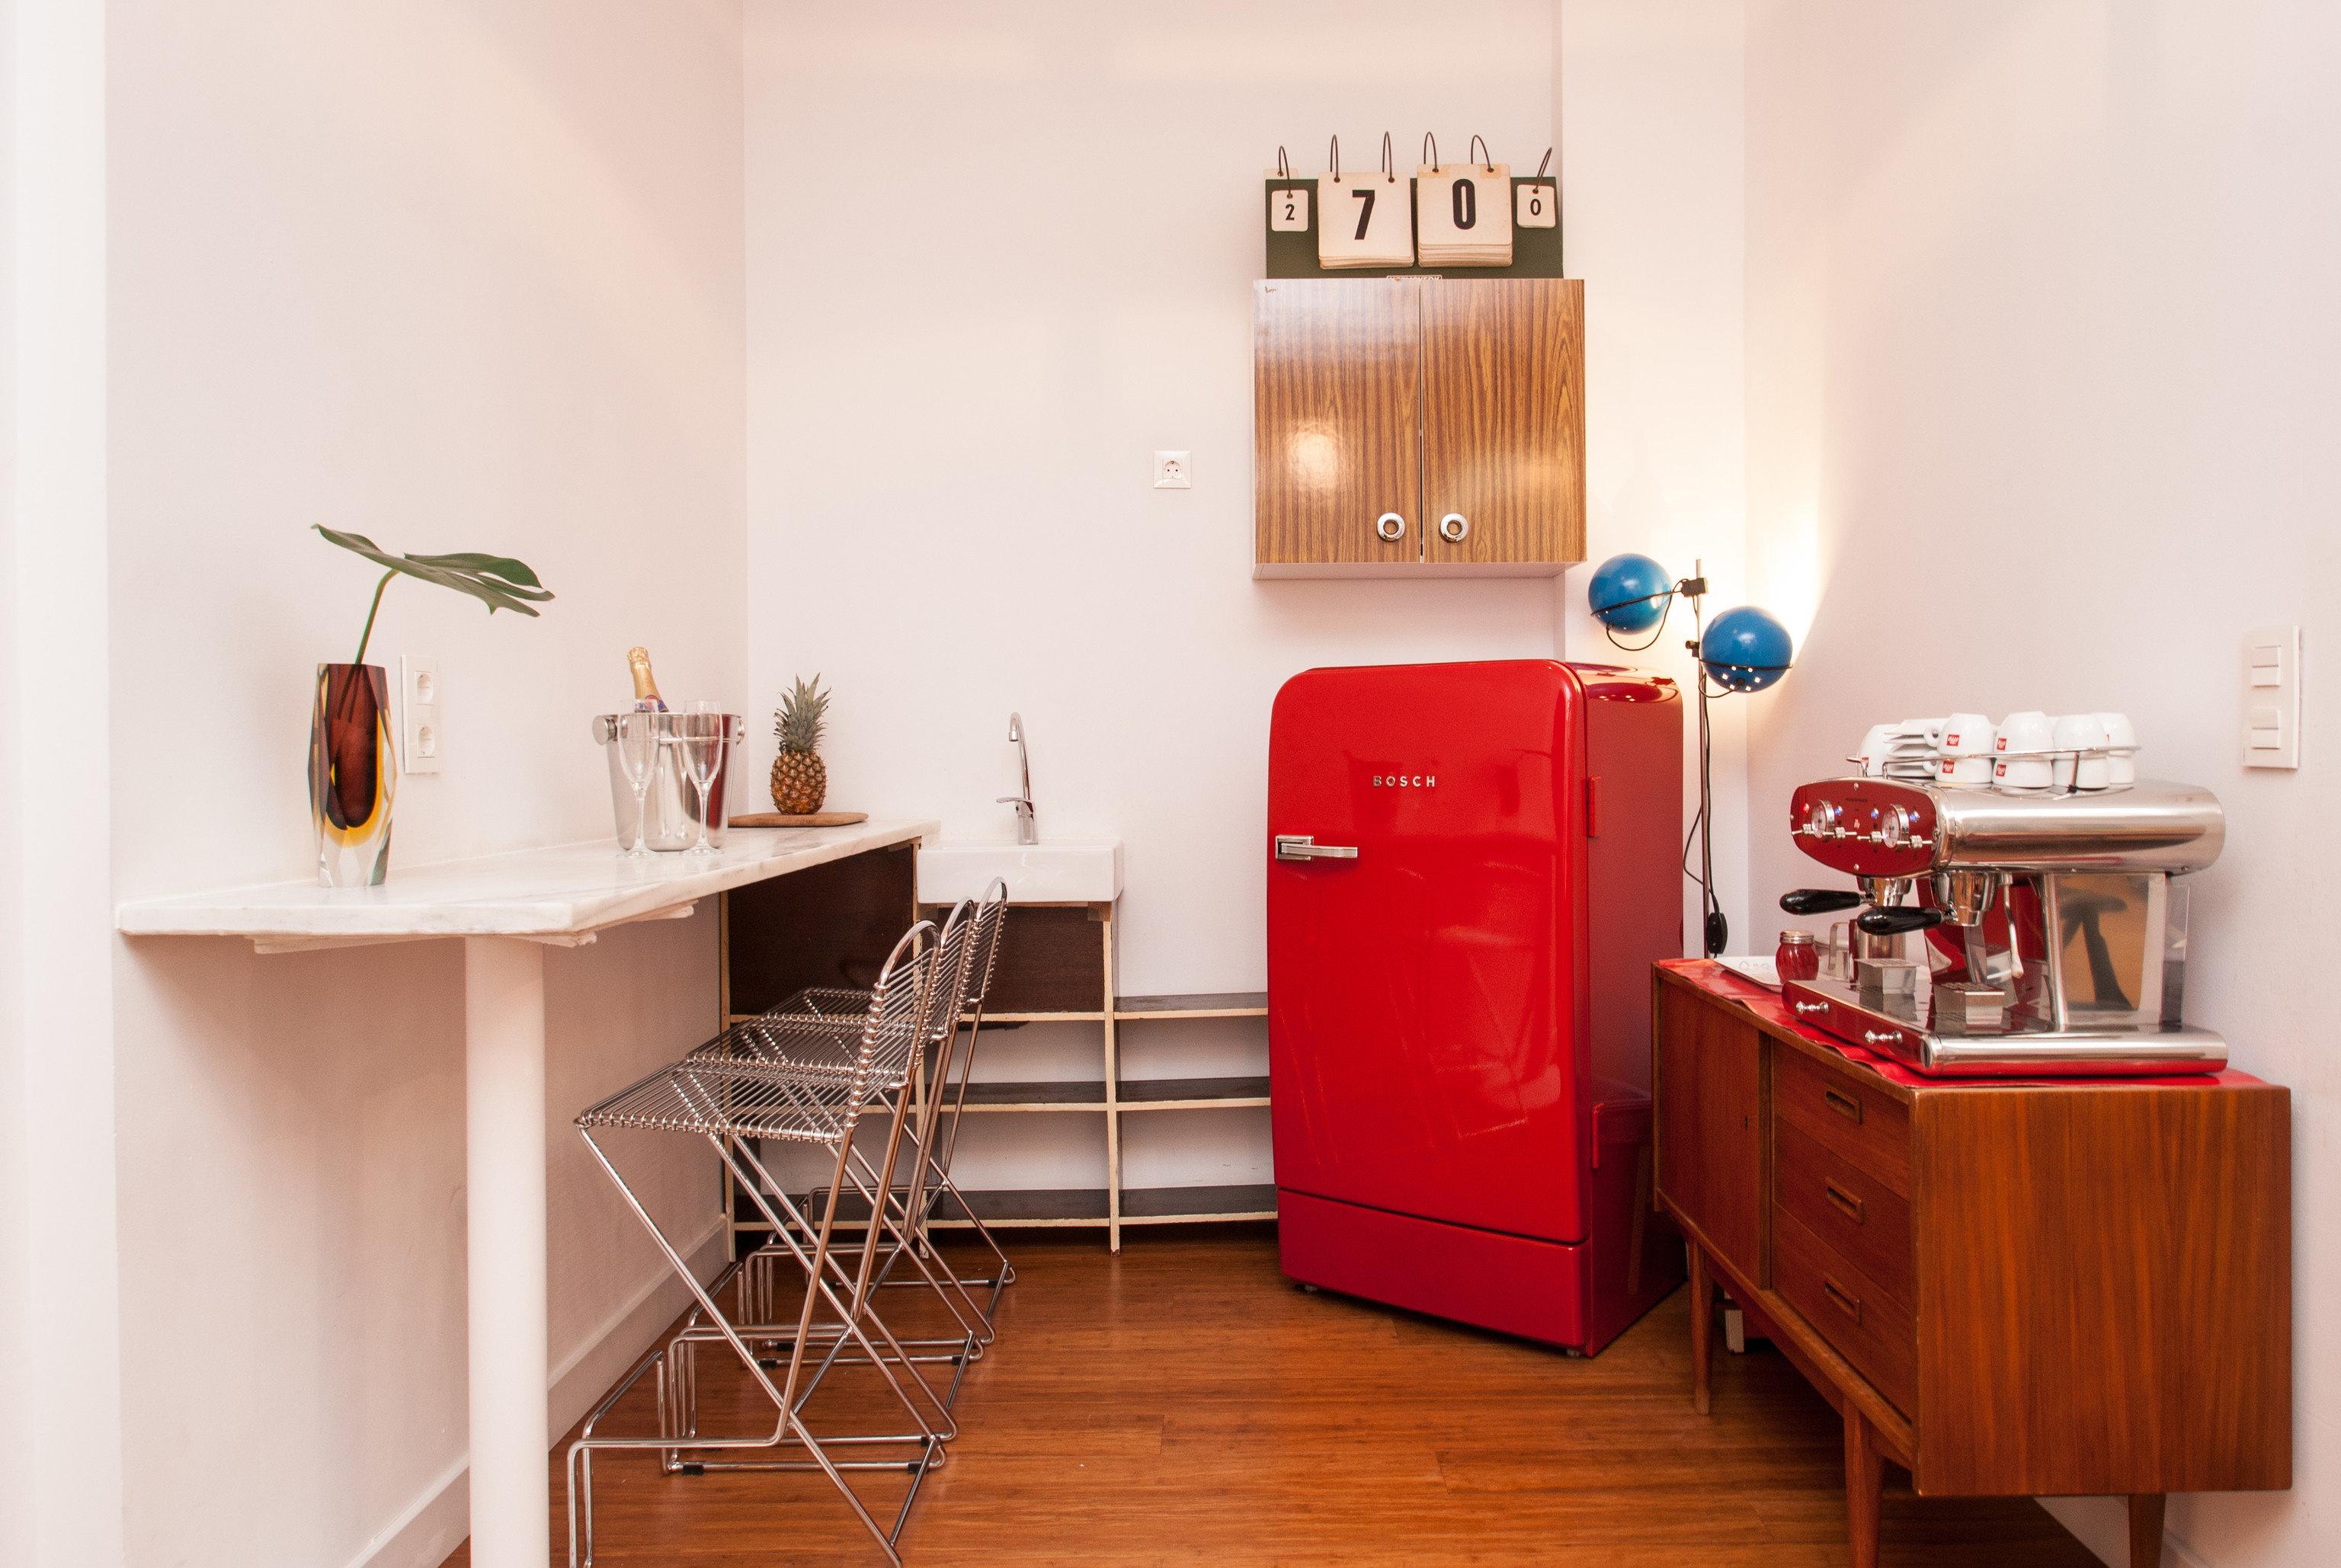 Hotels wall floor indoor room property Kitchen home interior design cabinetry cottage flooring apartment wood hard furniture Bedroom appliance